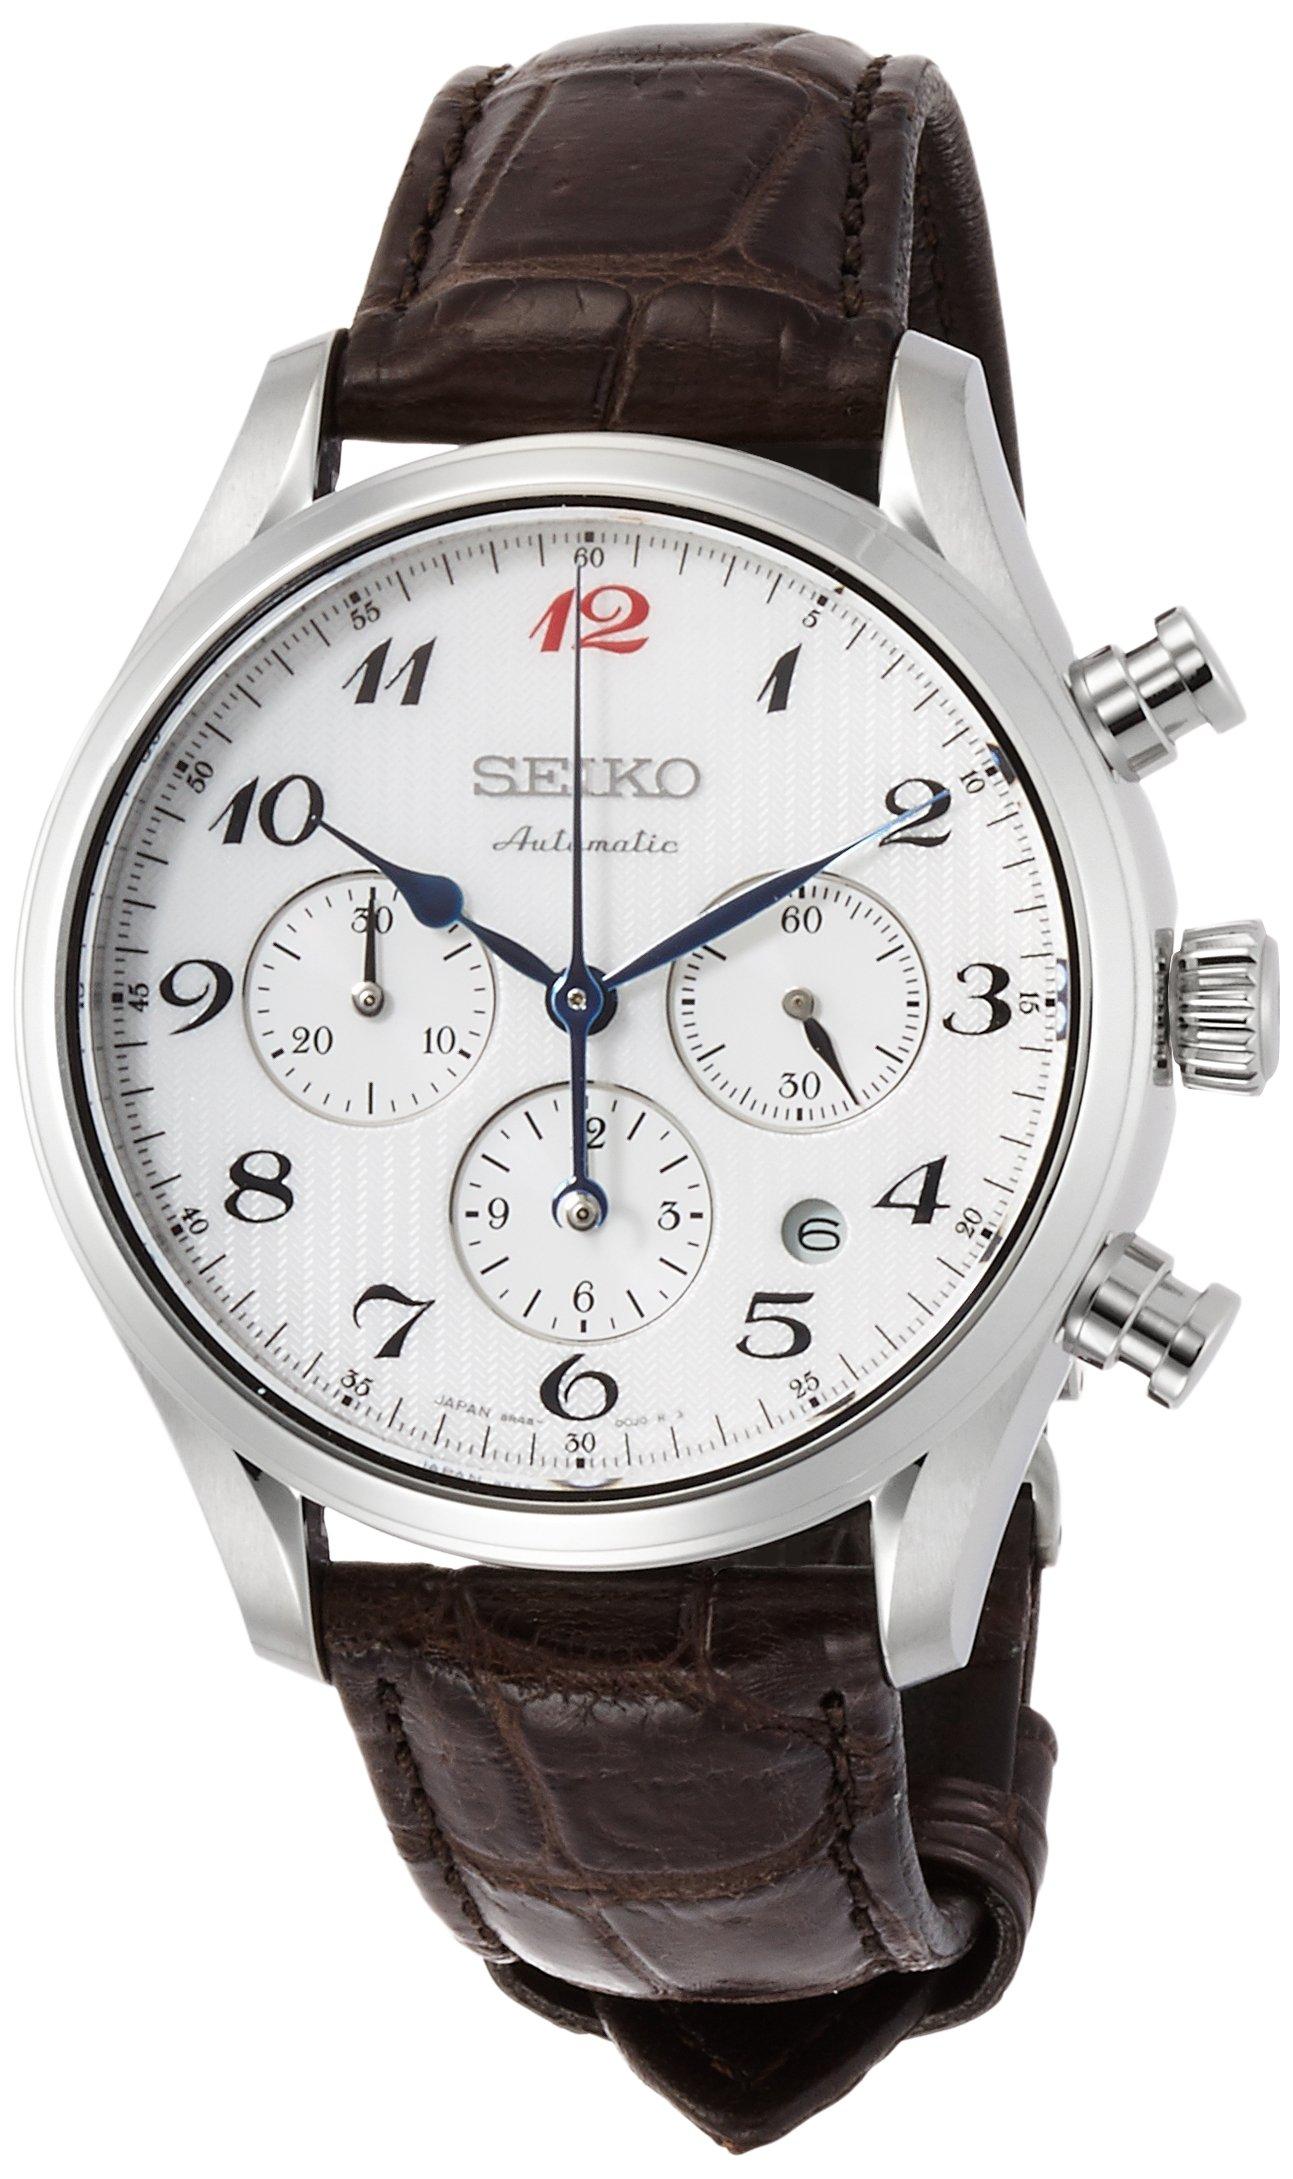 SEIKO (PRESAGE) ''Prestige line mechanical chronograph'' SARK011 men's(Japan Import-No Warranty)